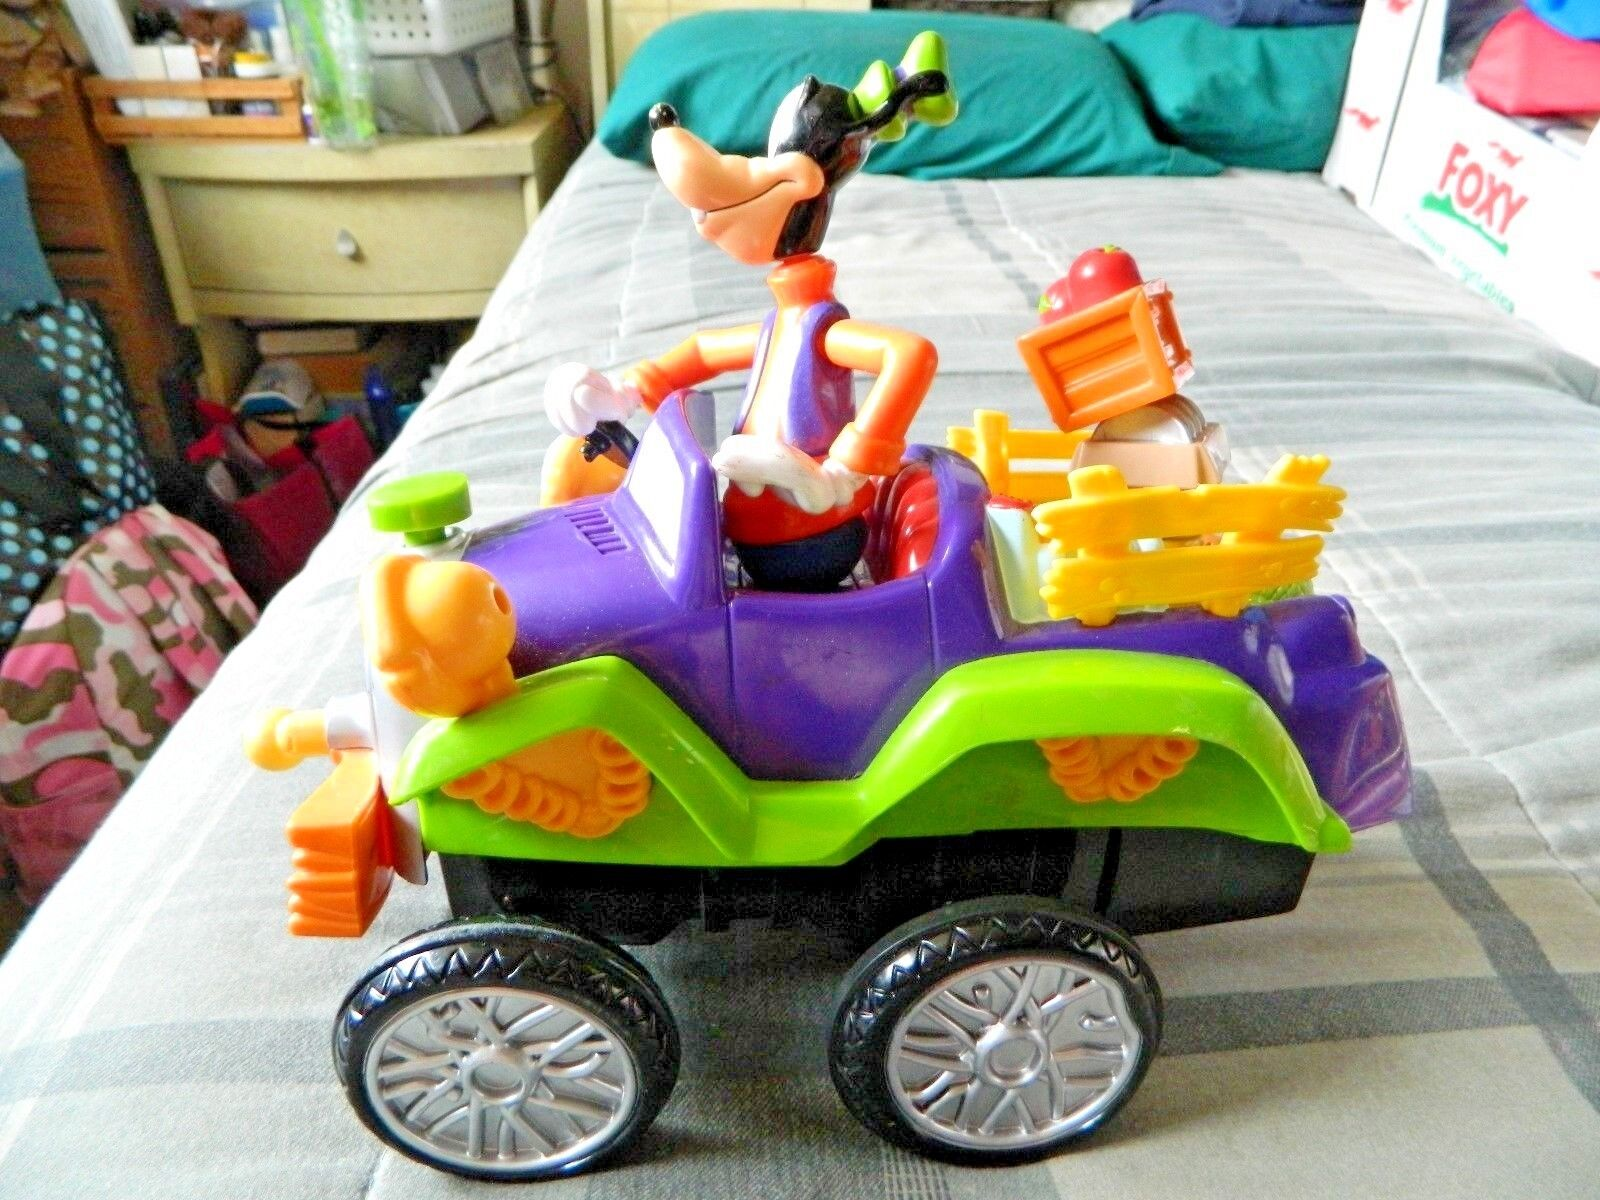 2000 Mattel Disney Goofy Jalopy Bumpy Ride Remote Control Car Pre Owned Works For Sale Online Ebay